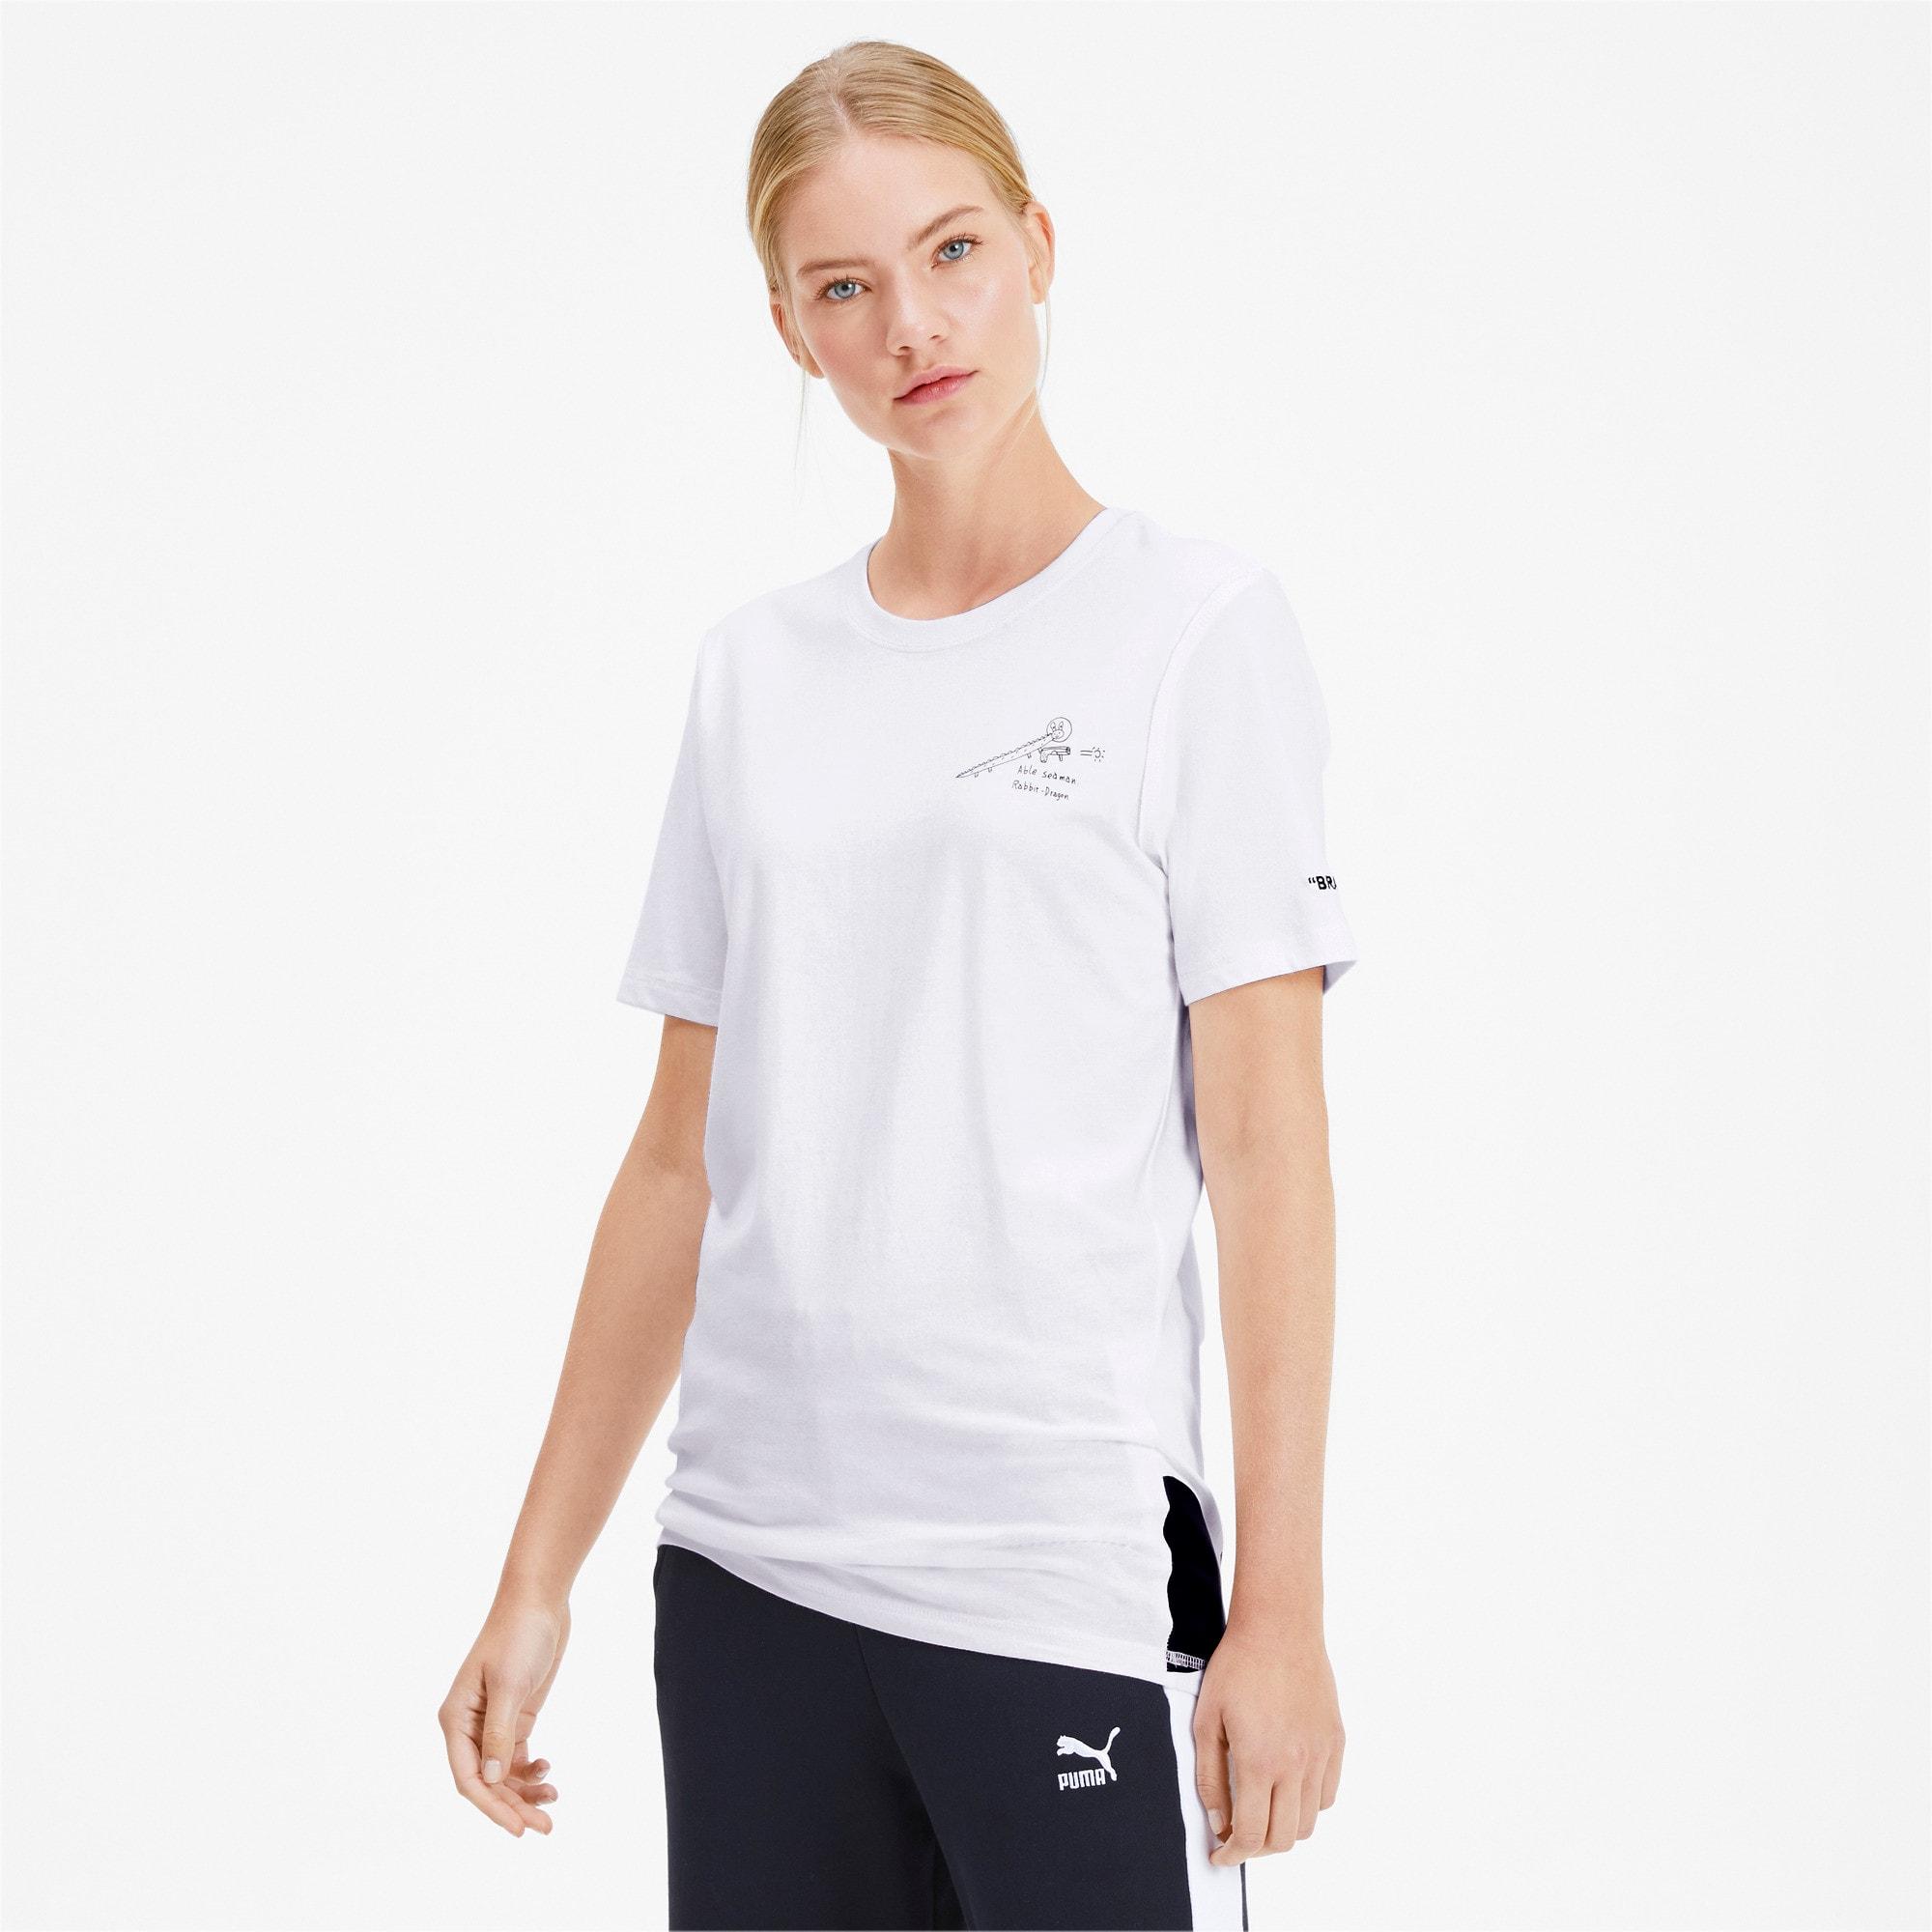 Thumbnail 2 of PUMA x TYAKASHA T-shirt, Puma White, medium